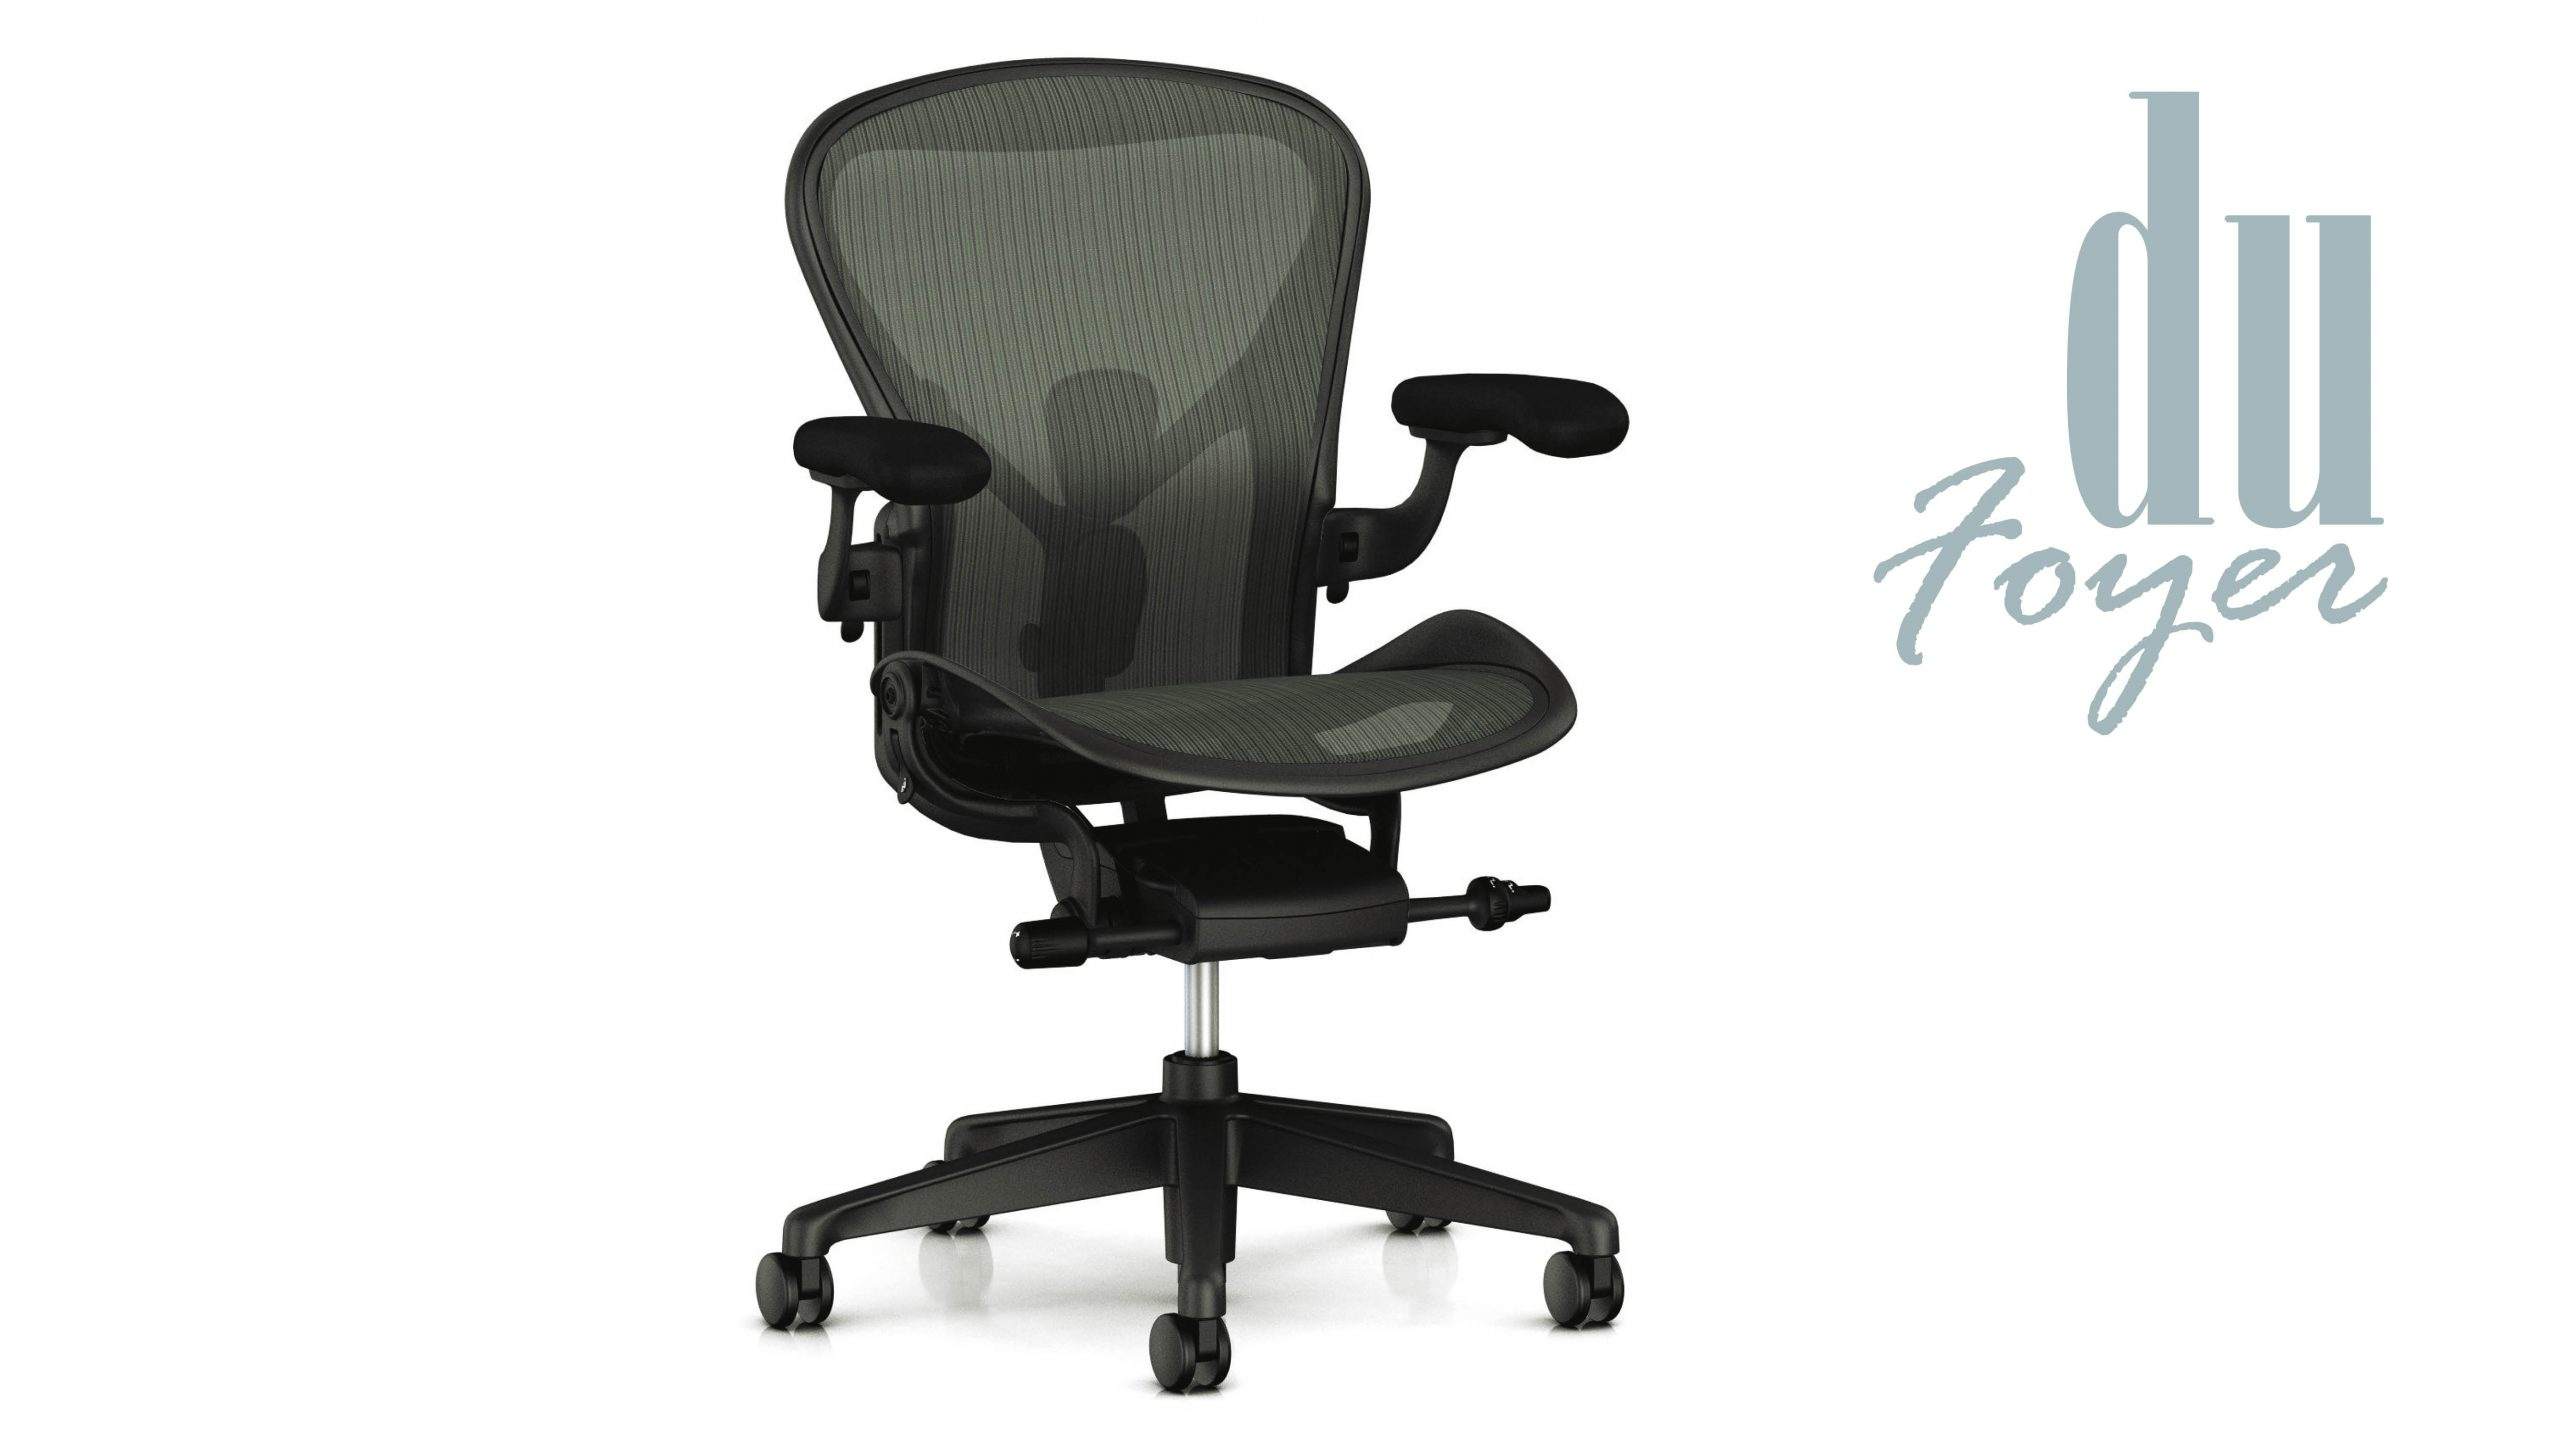 Win a luxurious, ergonomic desk chair Worth £1,175!